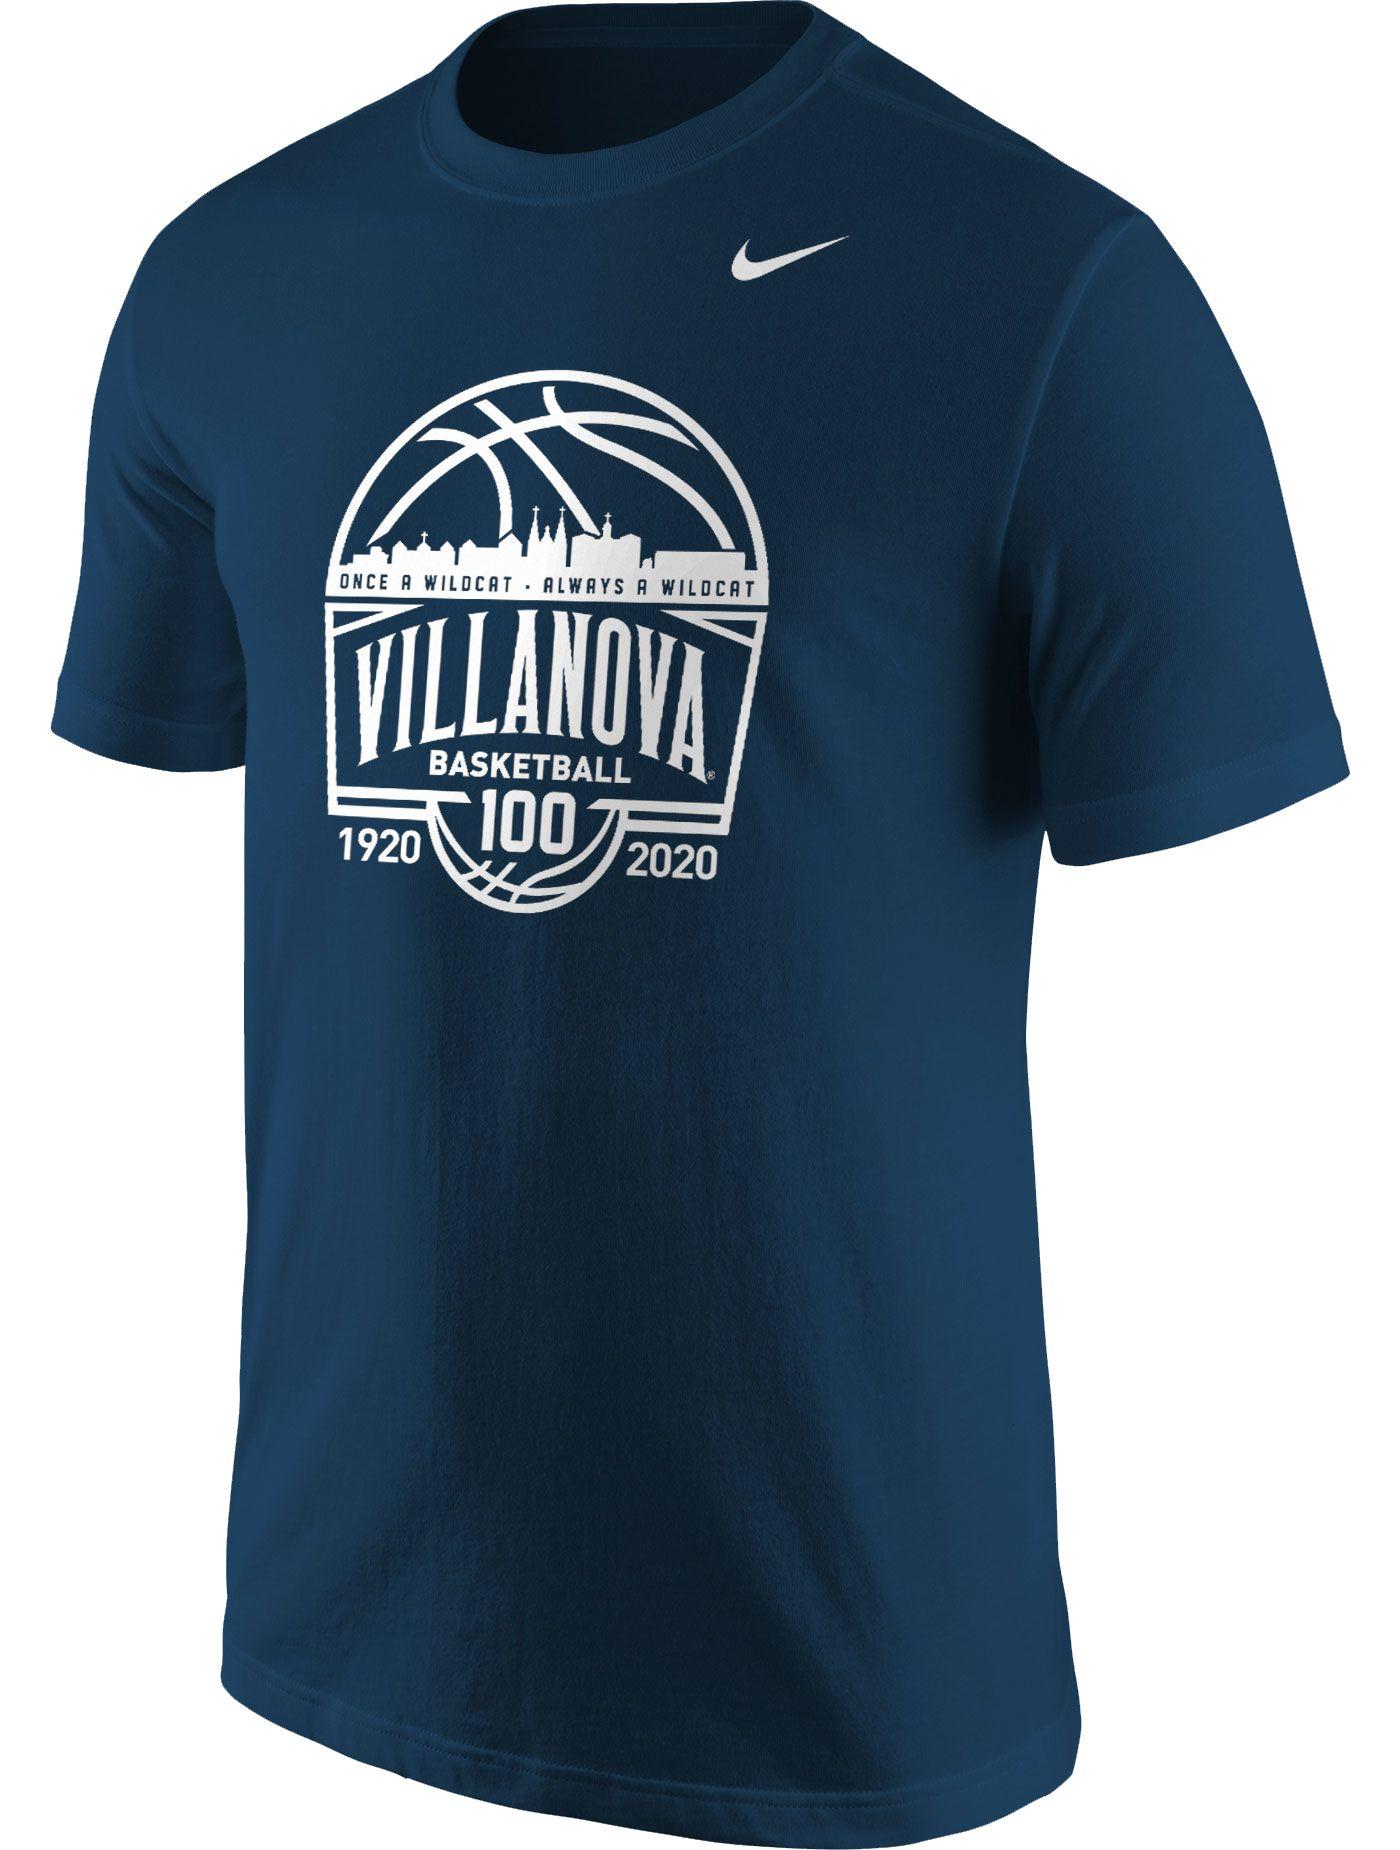 Nike Men's Villanova Wildcats Navy 100th Anniversary Basketball T-Shirt